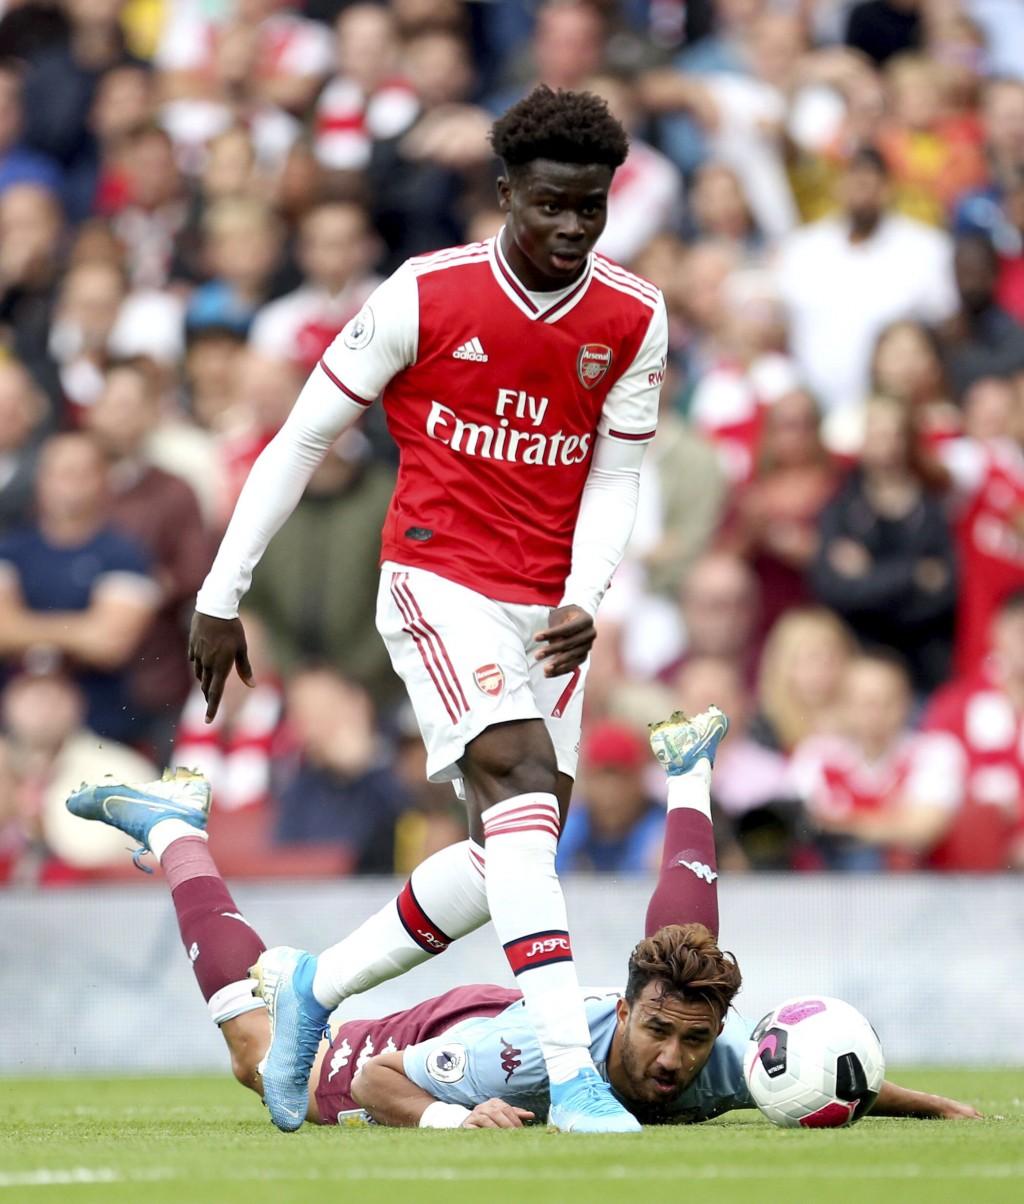 Arsenal's Bukayo Saka, top, and Aston Villa's Trezeguet battle for the ball during the Premier League match at the Emirates Stadium, London, Sunday, S...